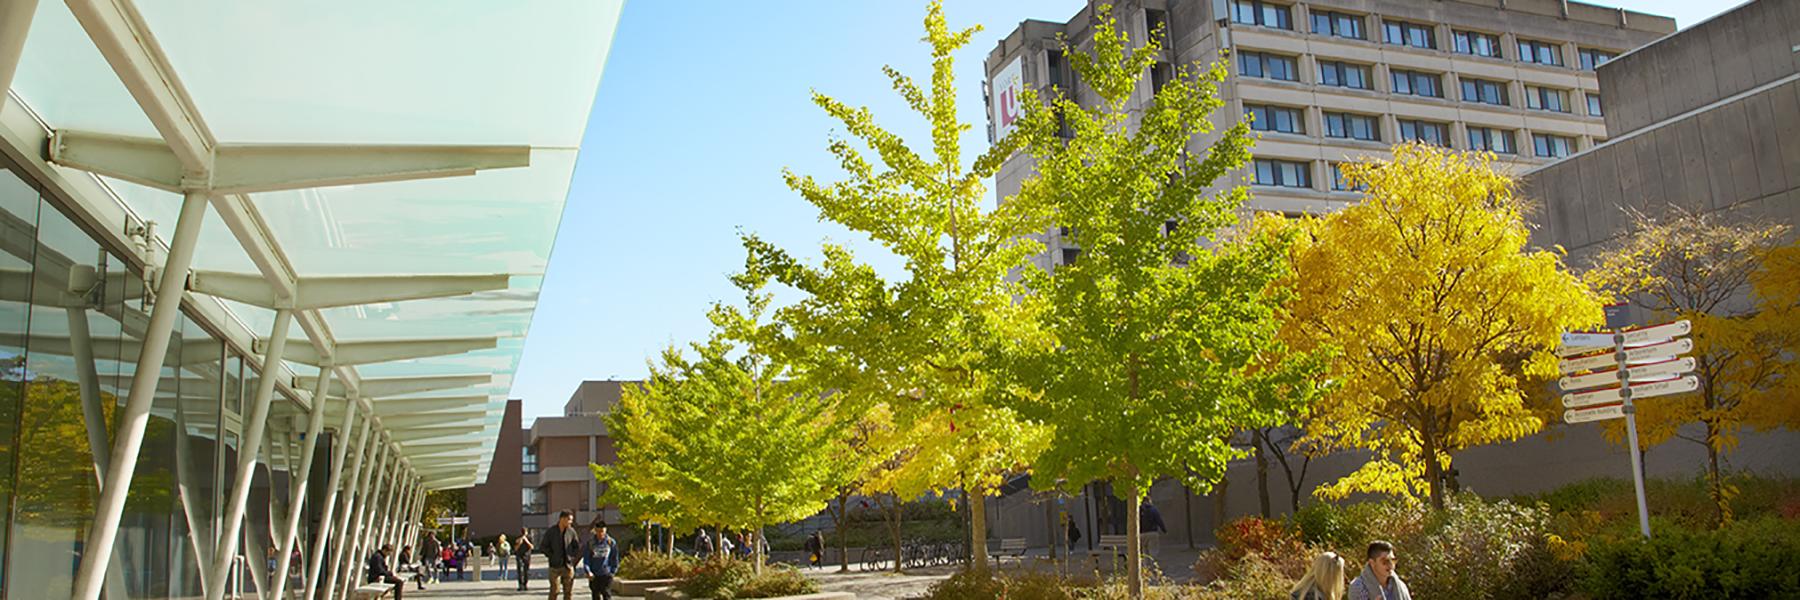 Campus Walk with the Lassonde School of Engineering building